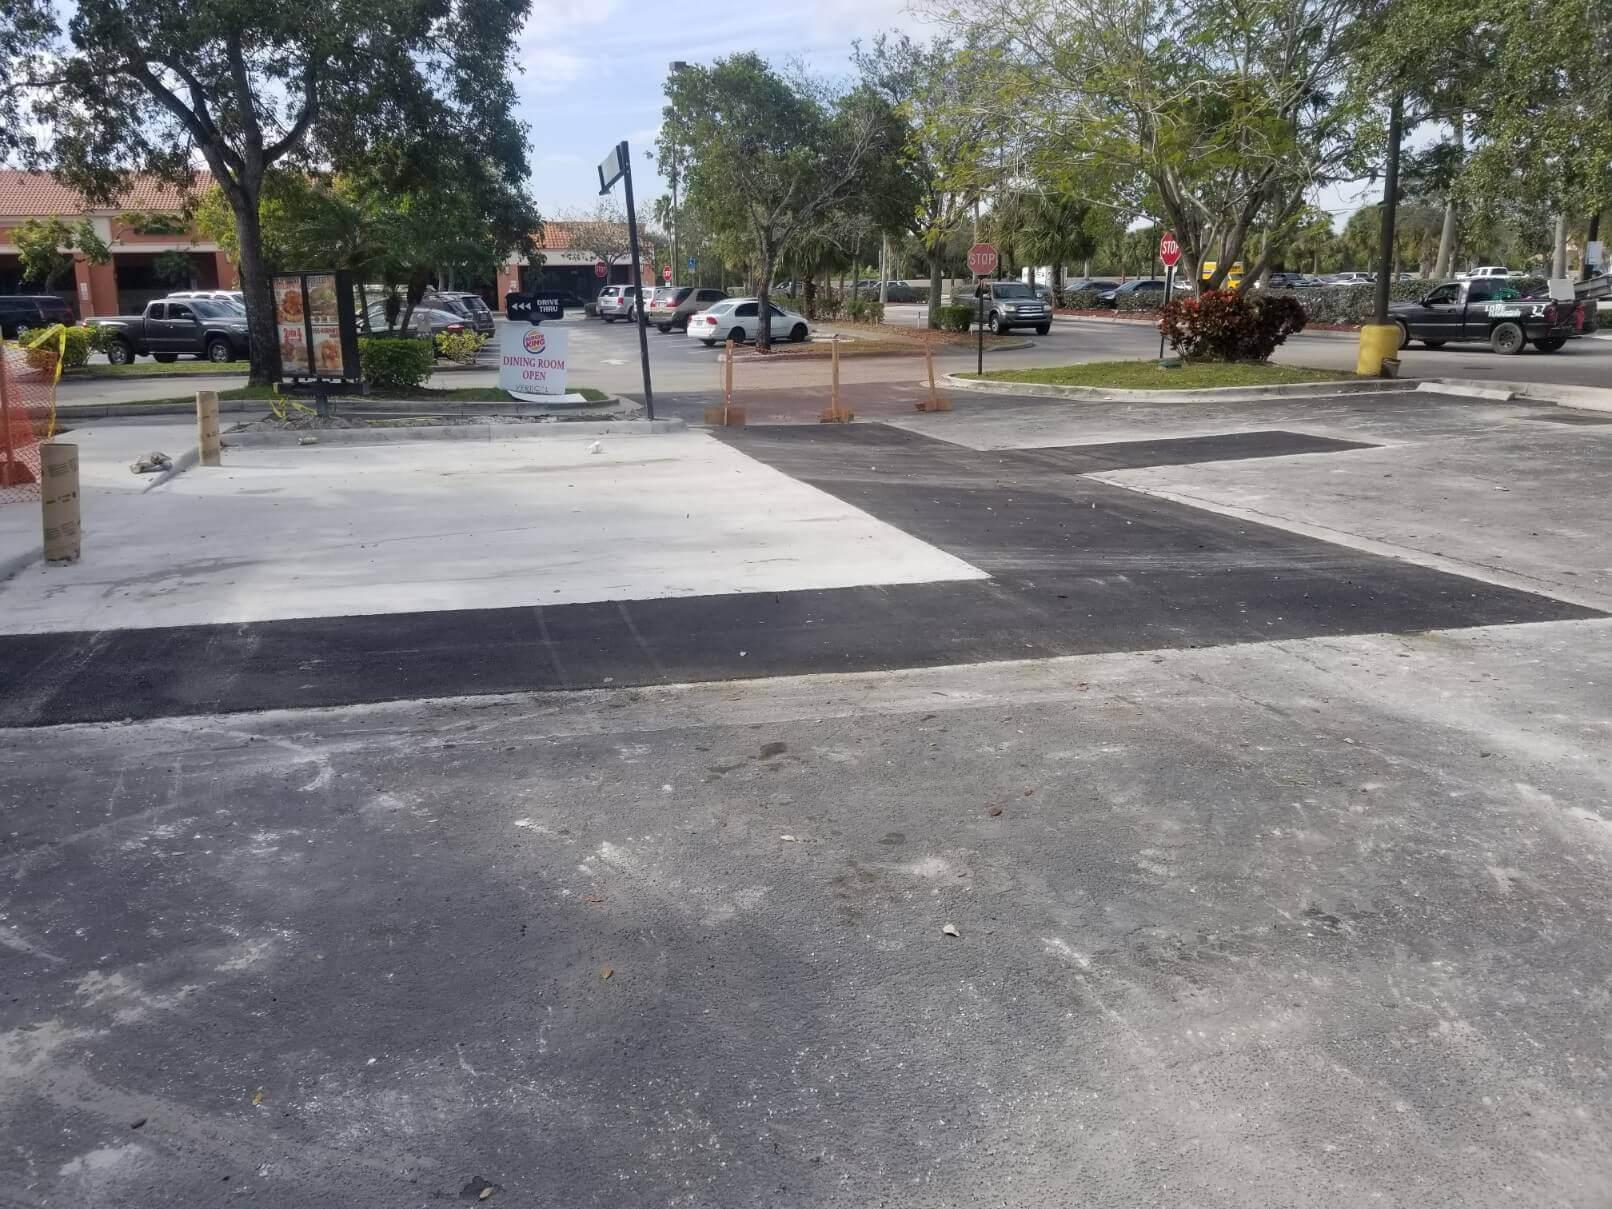 PaveCo National asphalt paving and repair